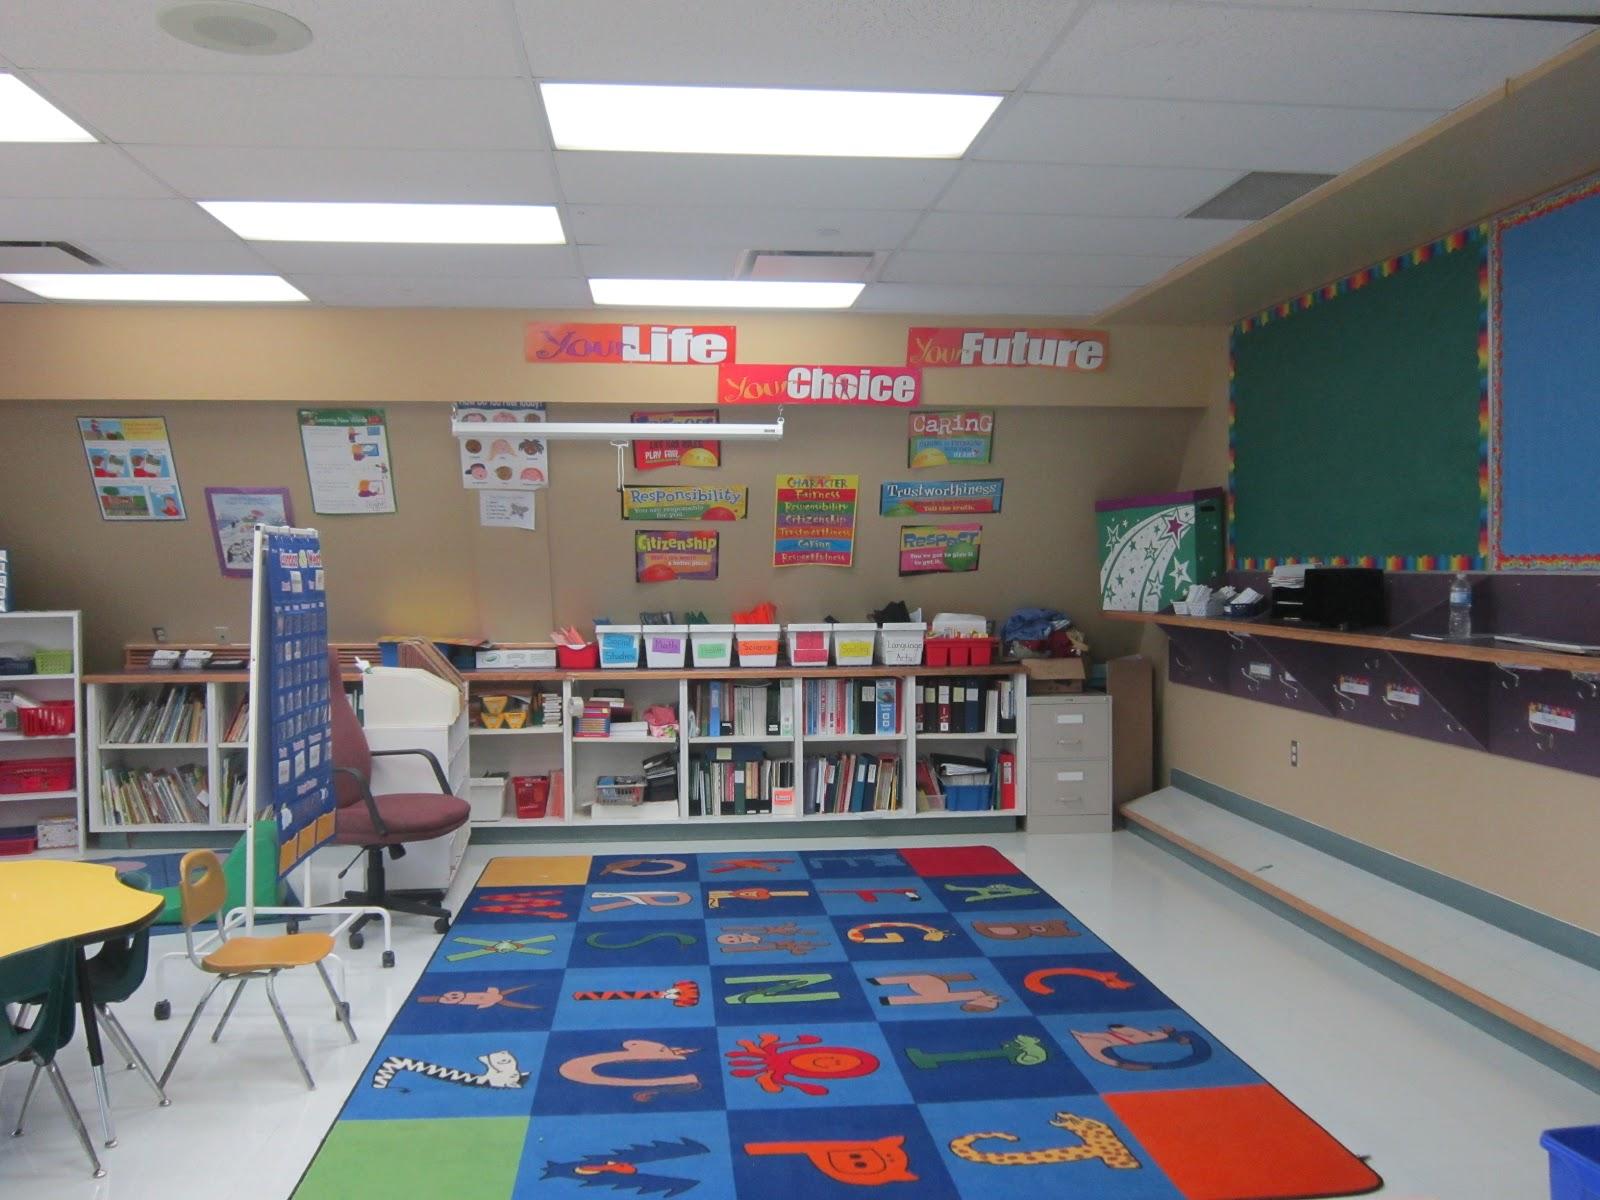 egitimteknolojinet_classroom_decoration (7)